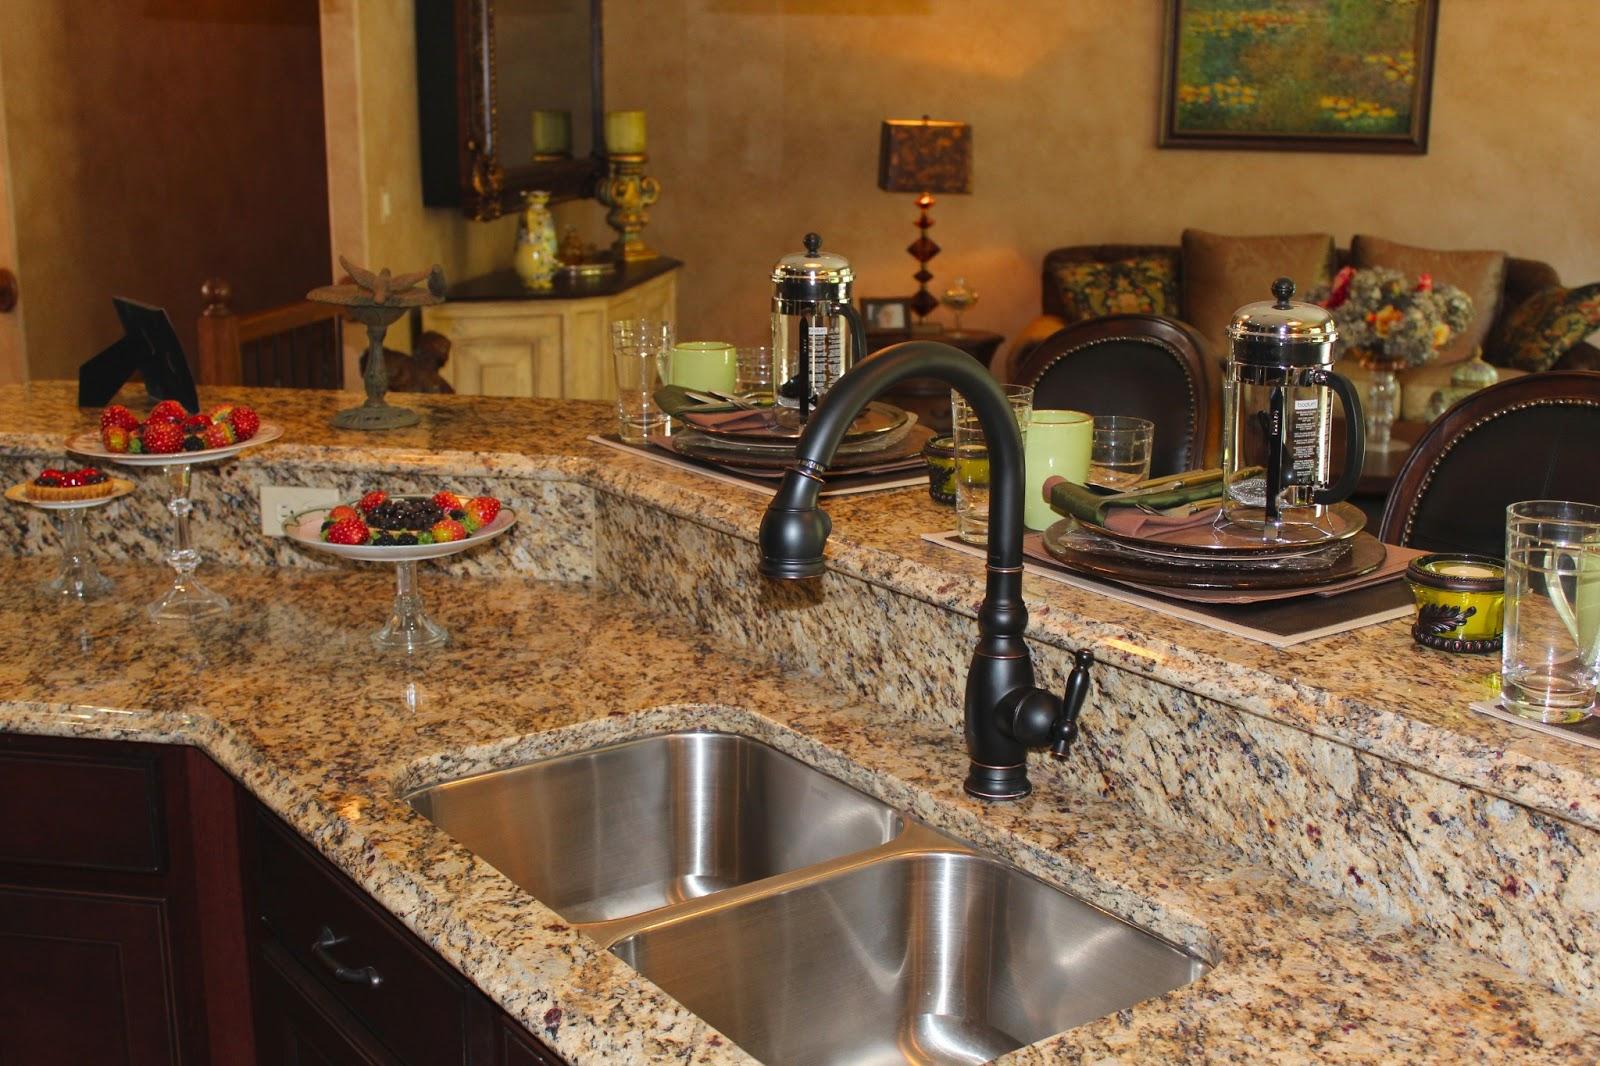 kitchen countertops benefits of granite corian kitchen countertops Home Channel TV Blog